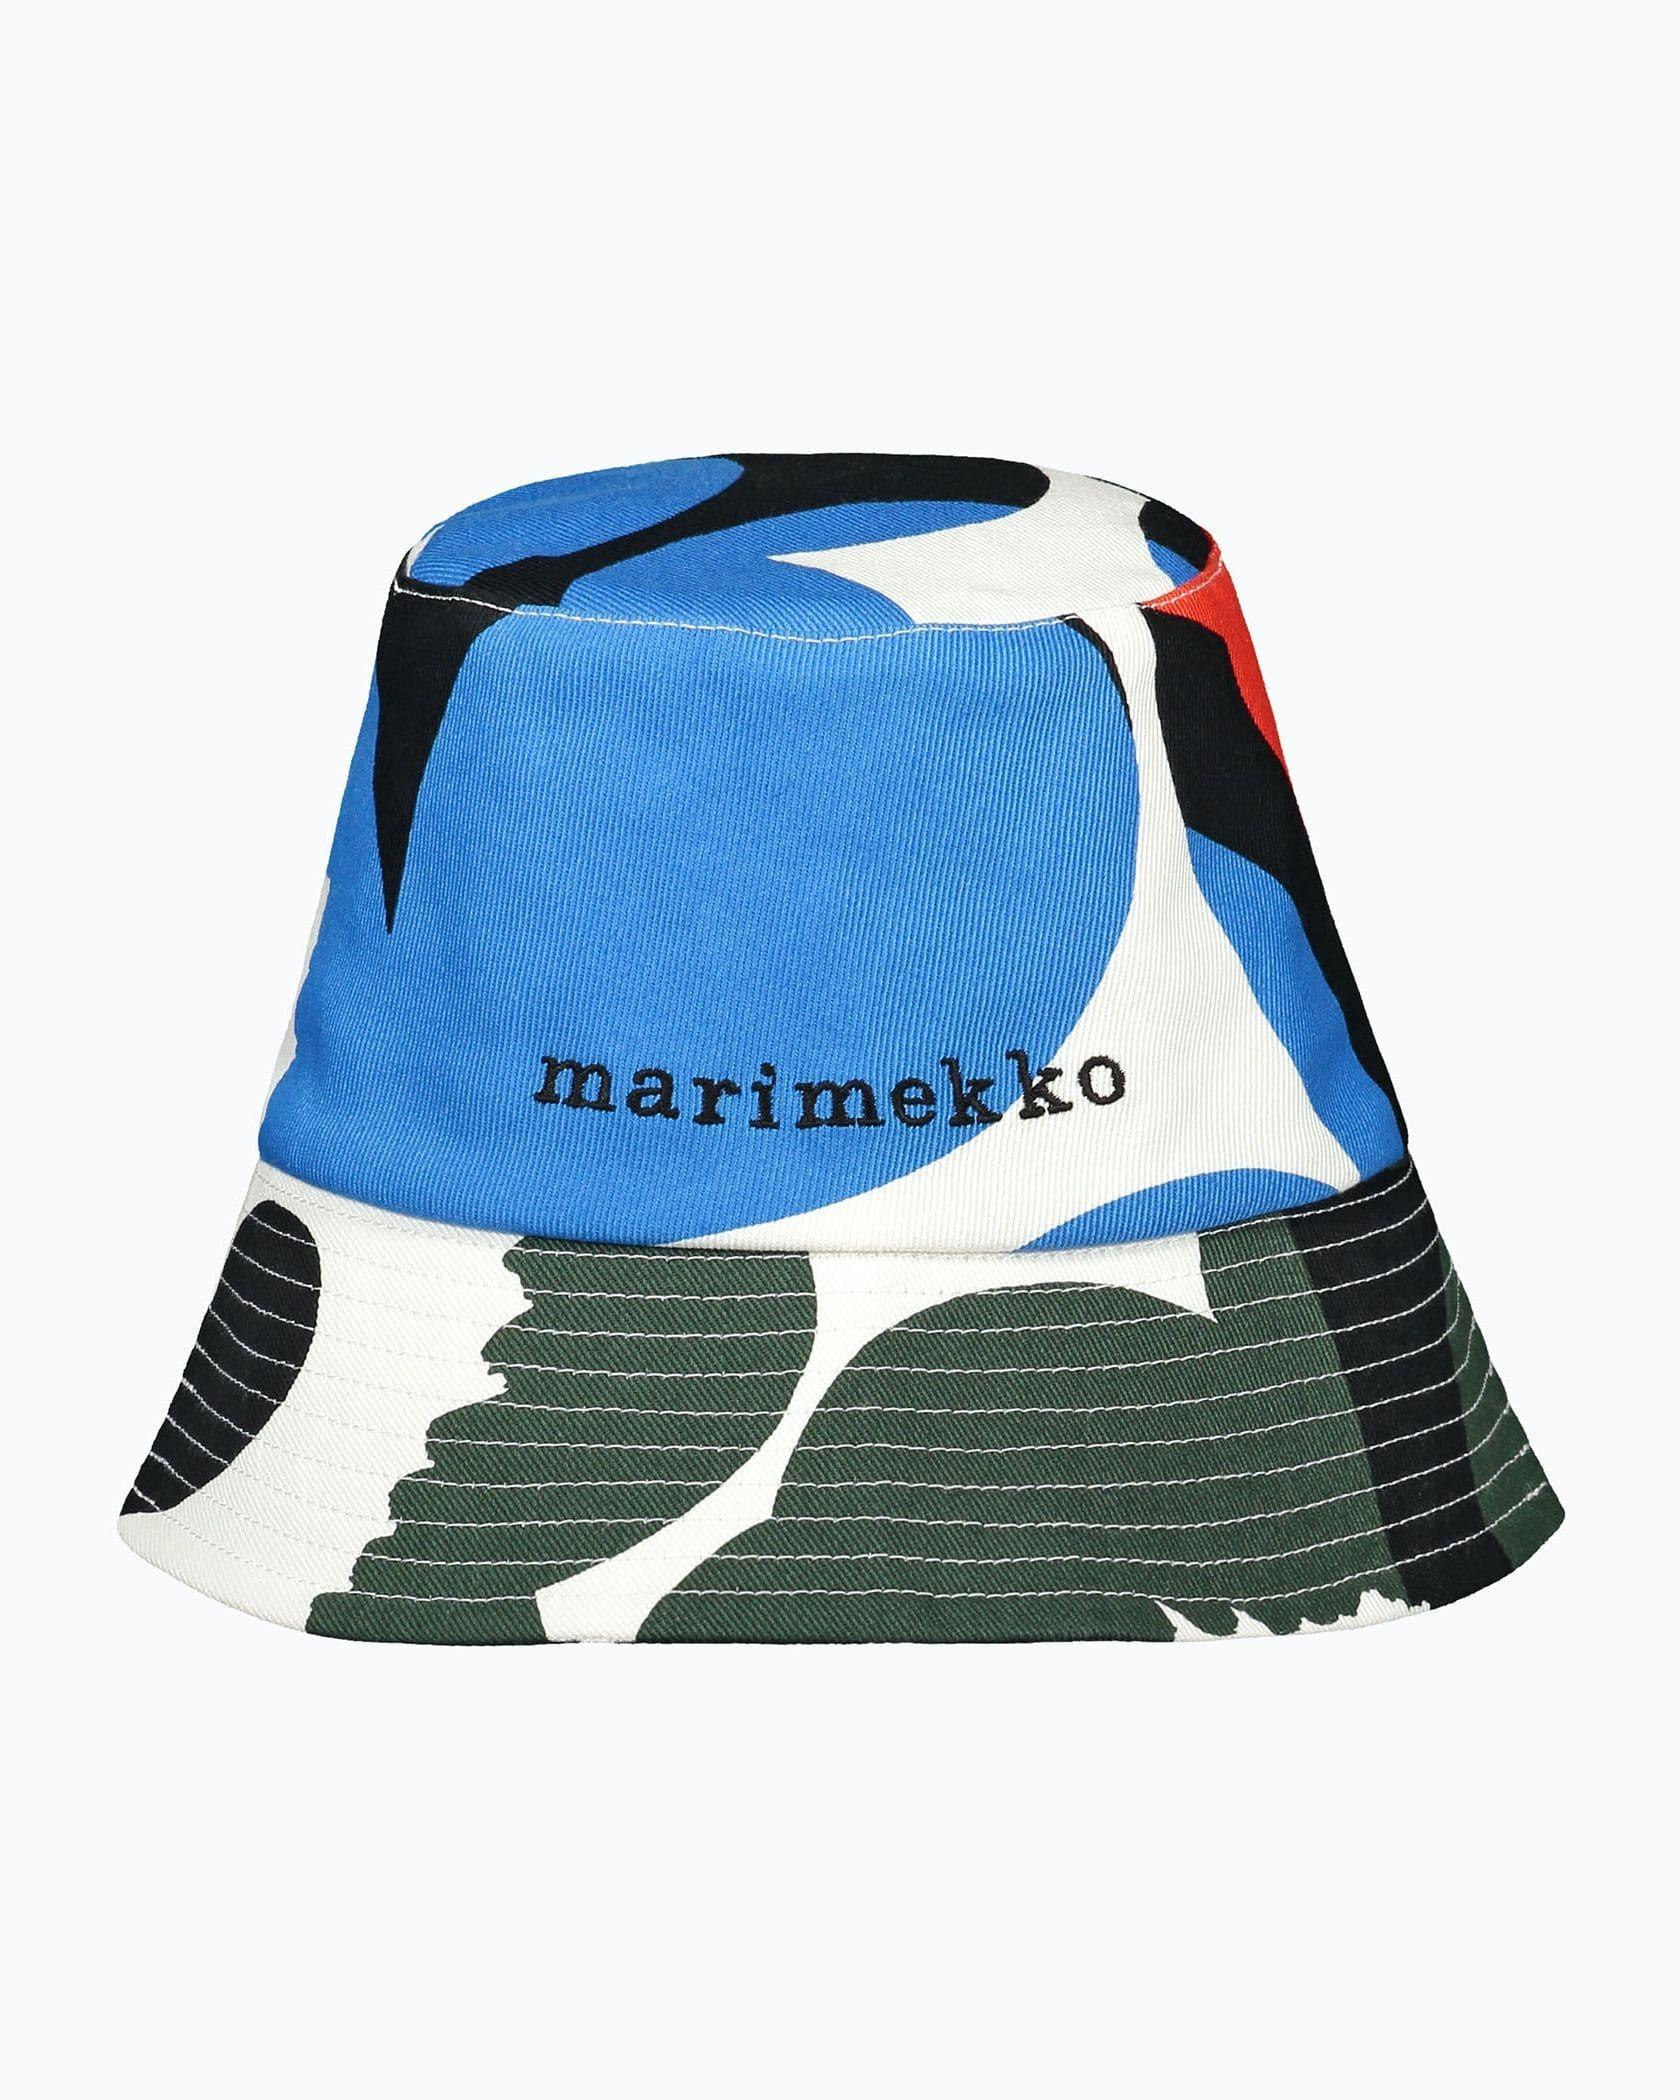 Lakka Unikko/ Marimekko Co-created ハット